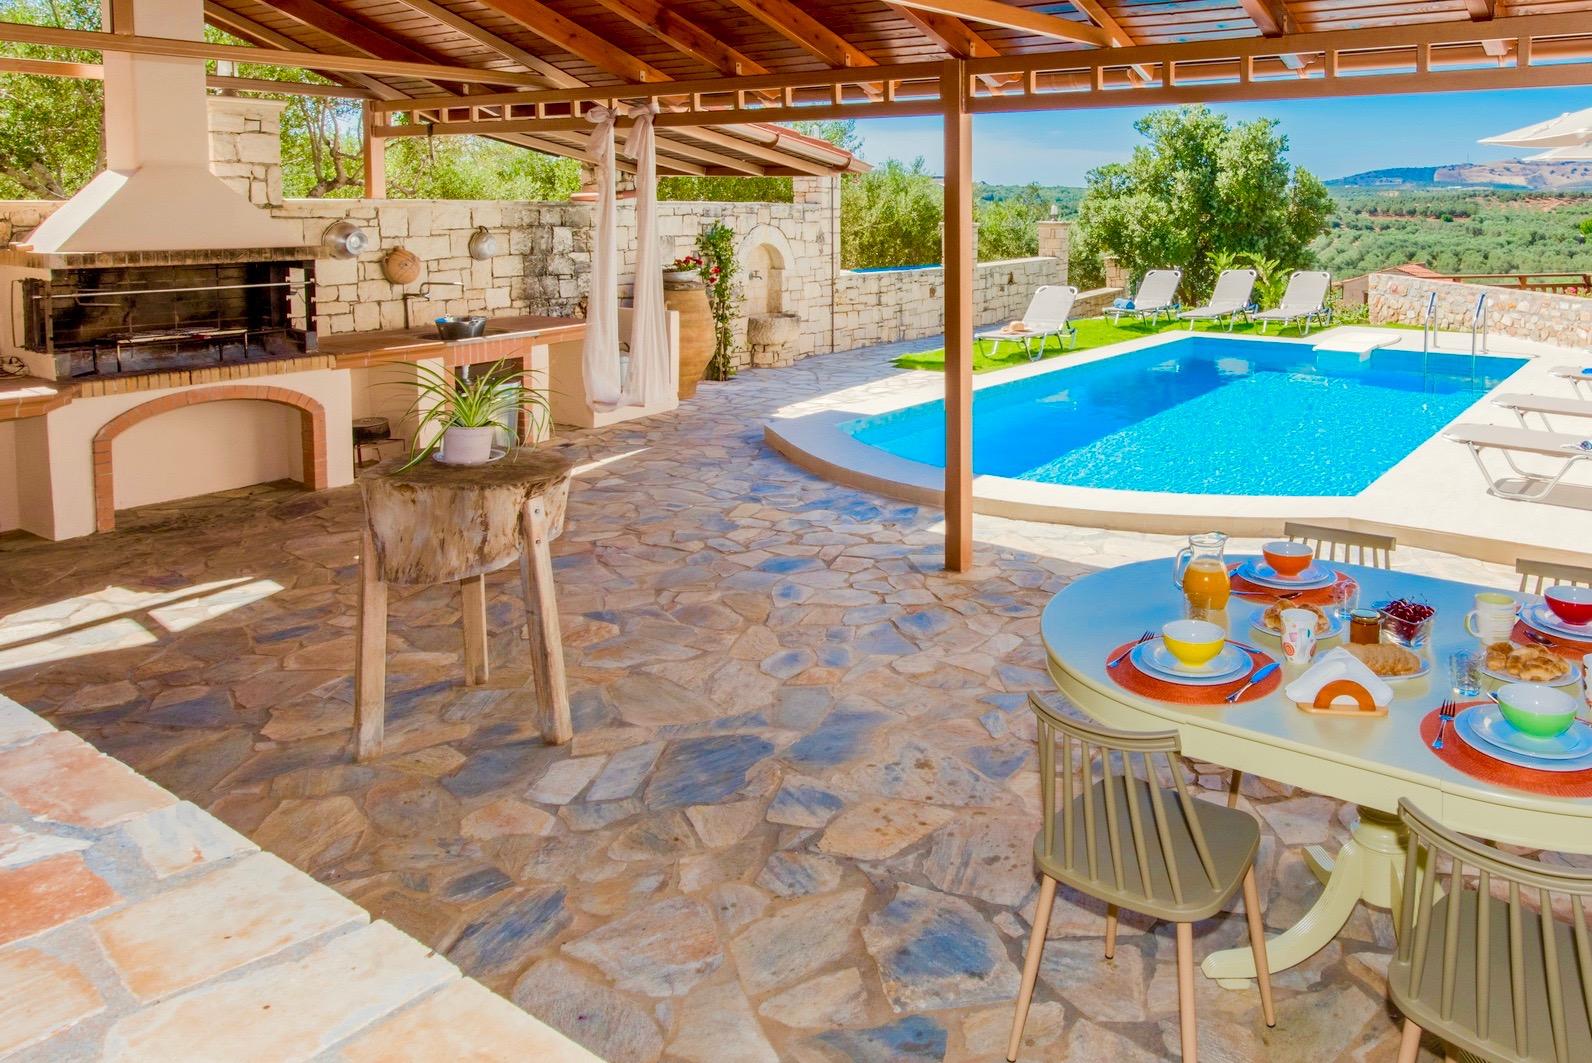 Ferienhaus Luxury Villa Korini with private swimming pool (2470495), Roumeli, Kreta Nordküste, Kreta, Griechenland, Bild 21